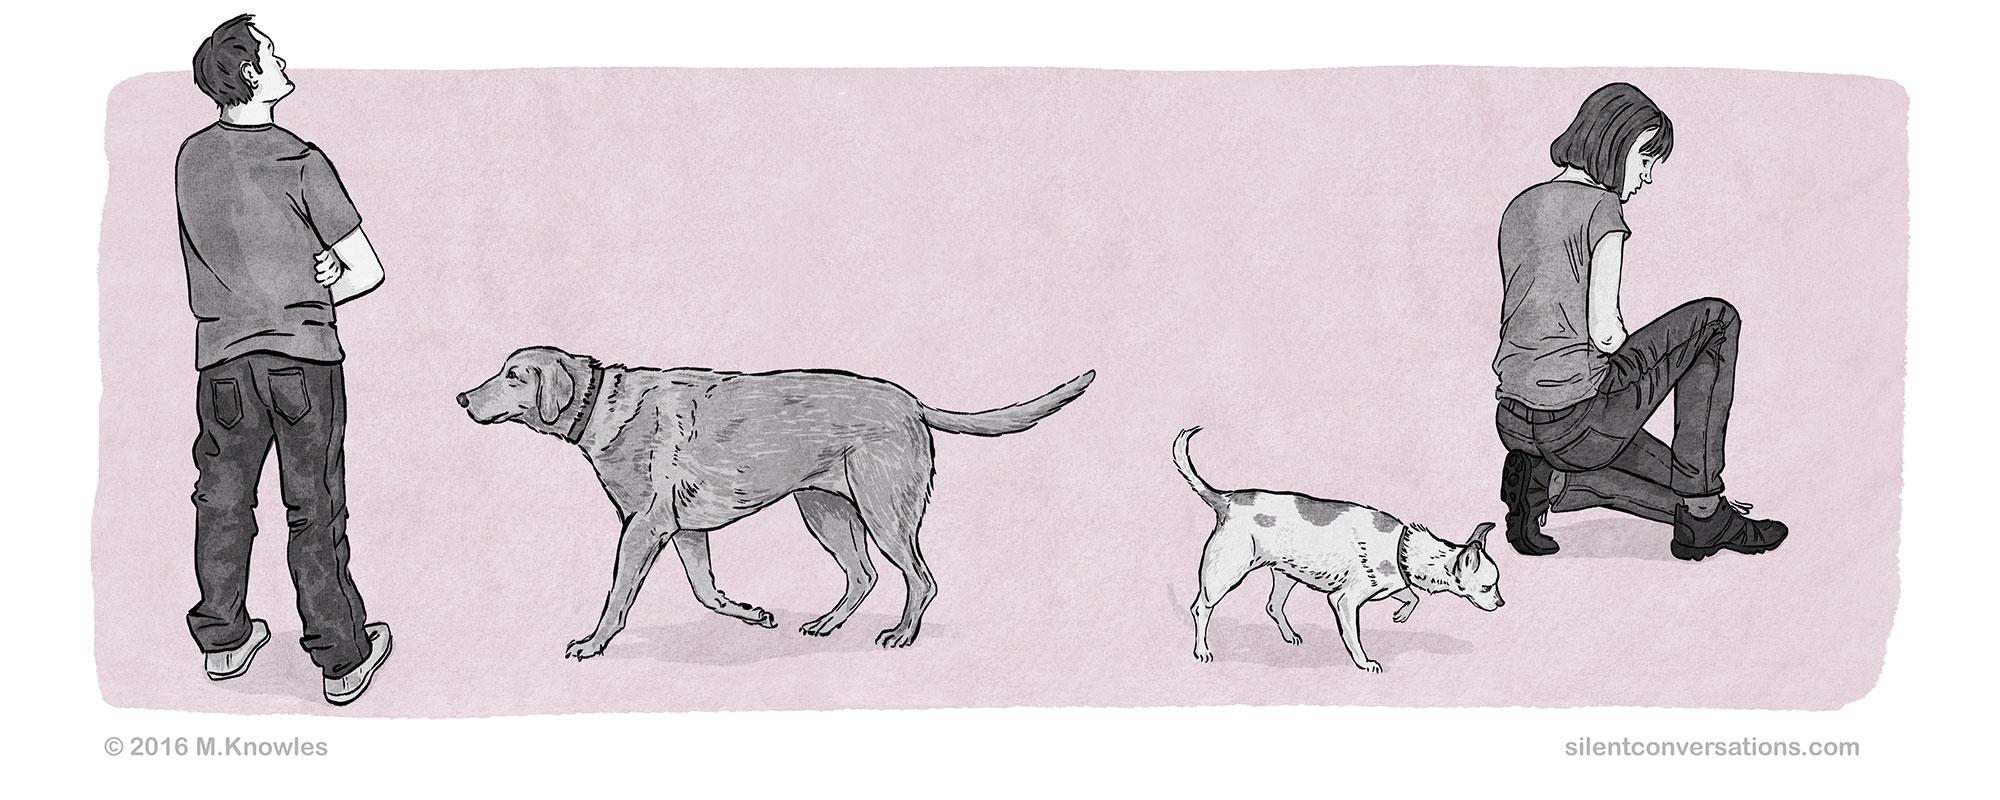 Dog Body Language How Do You Greet A Dog Politely